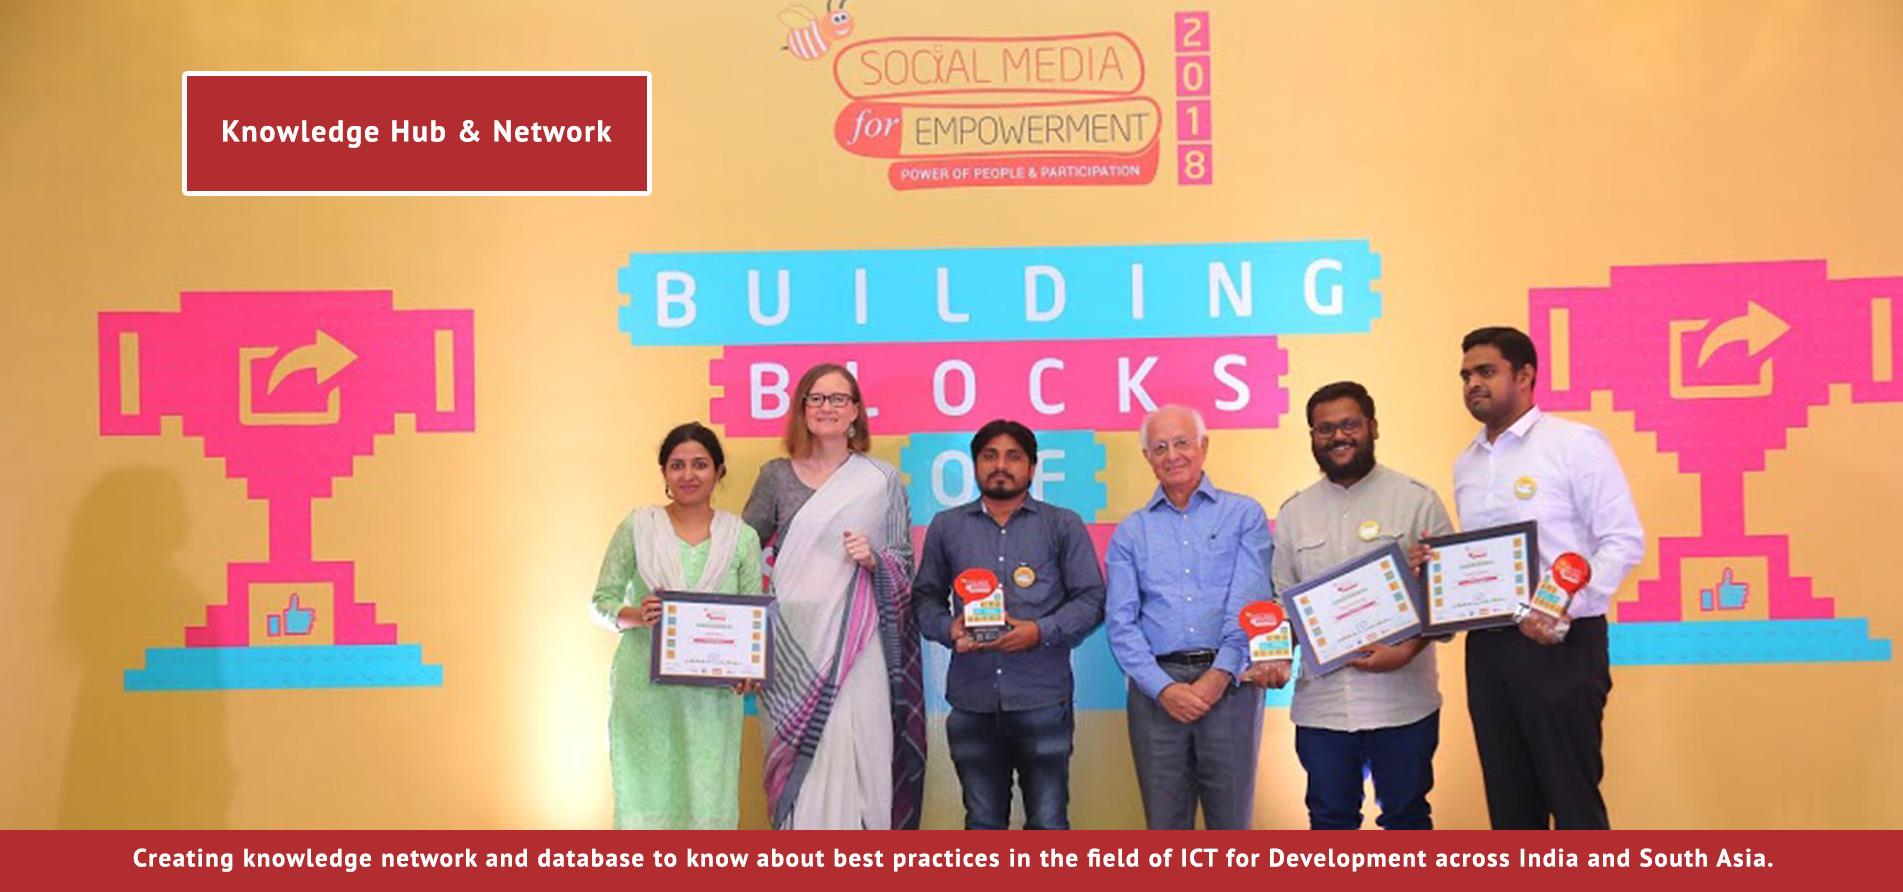 Knowledge-Hub-Network